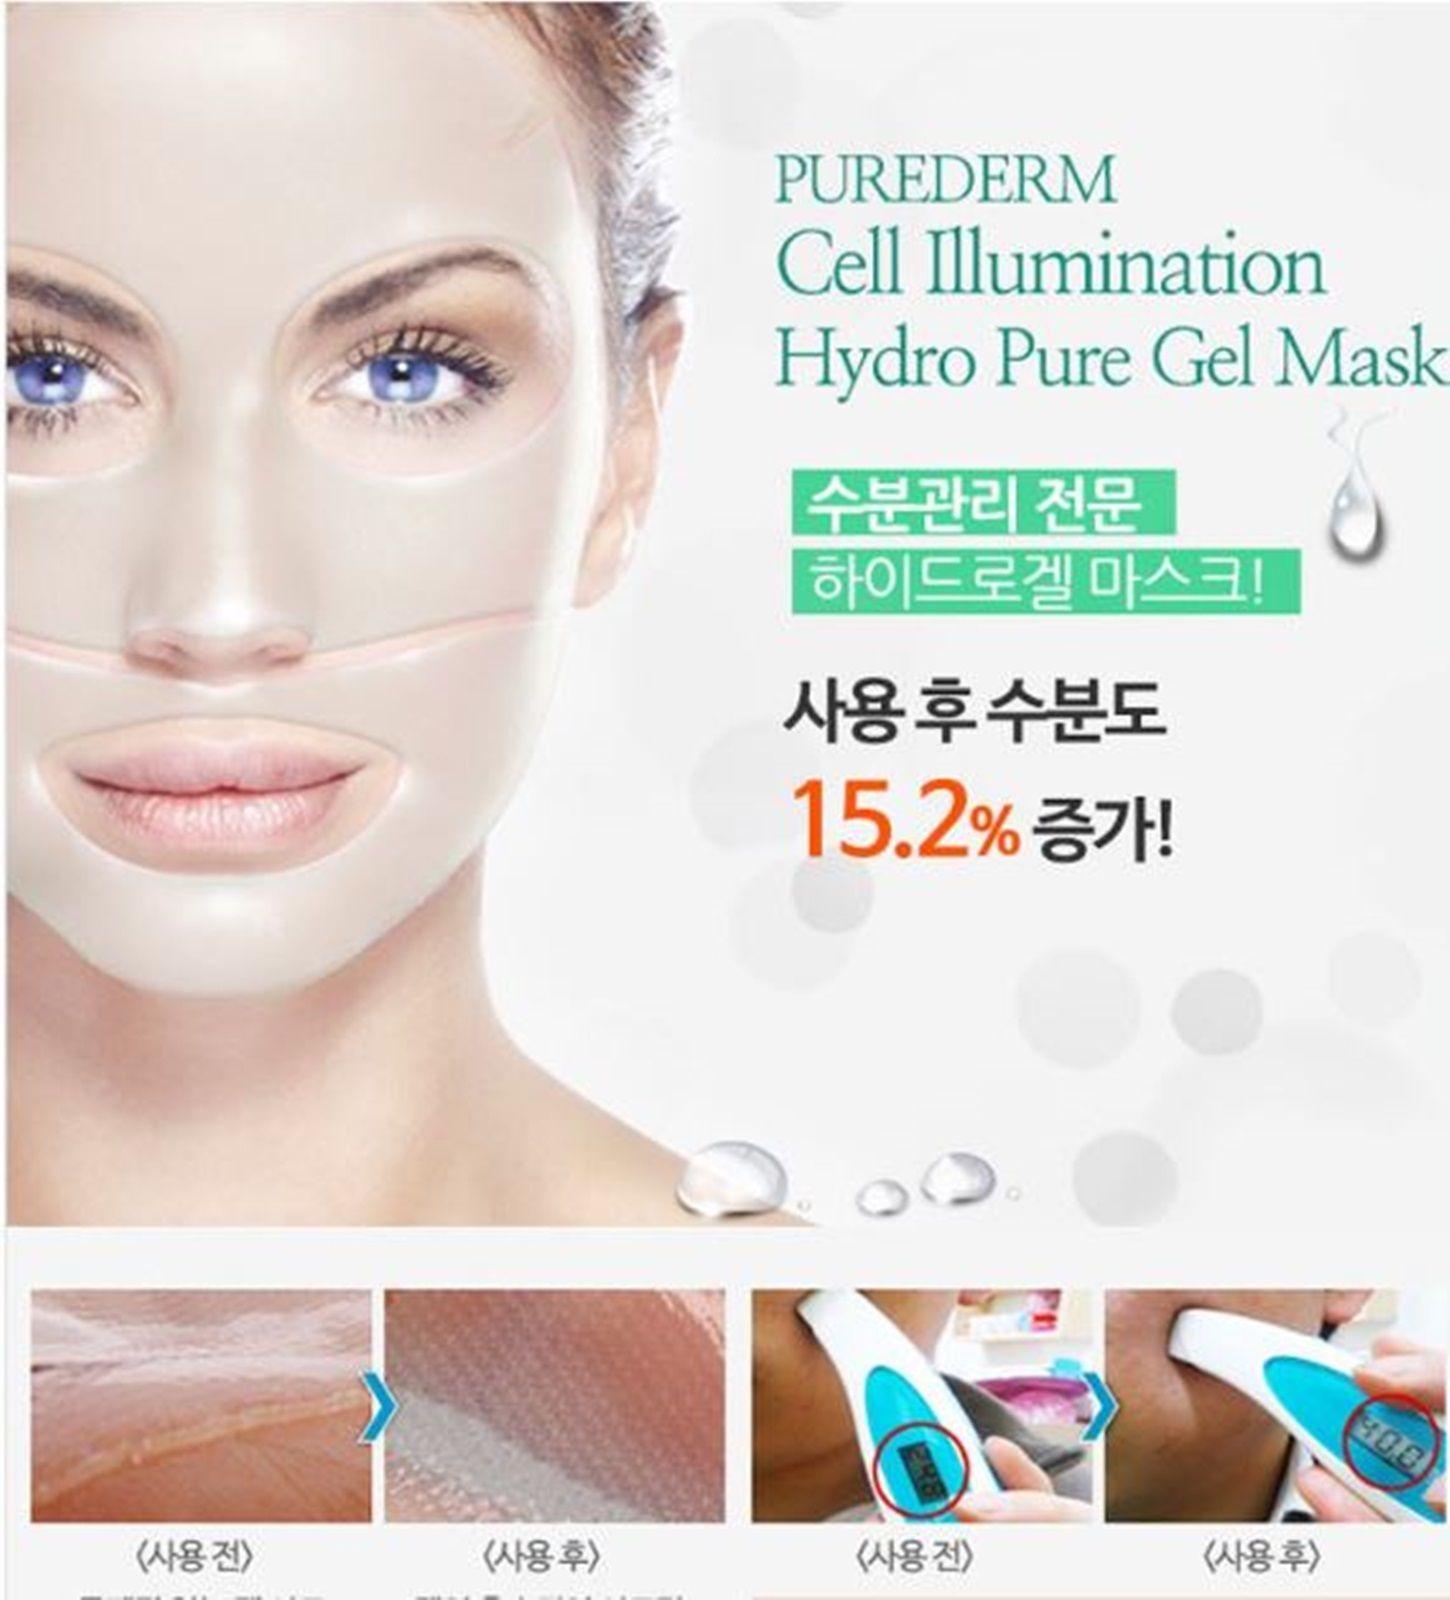 Purederm Cell Illuminating Hydro Pure Gel Mask Alomonbsclv Eye 410